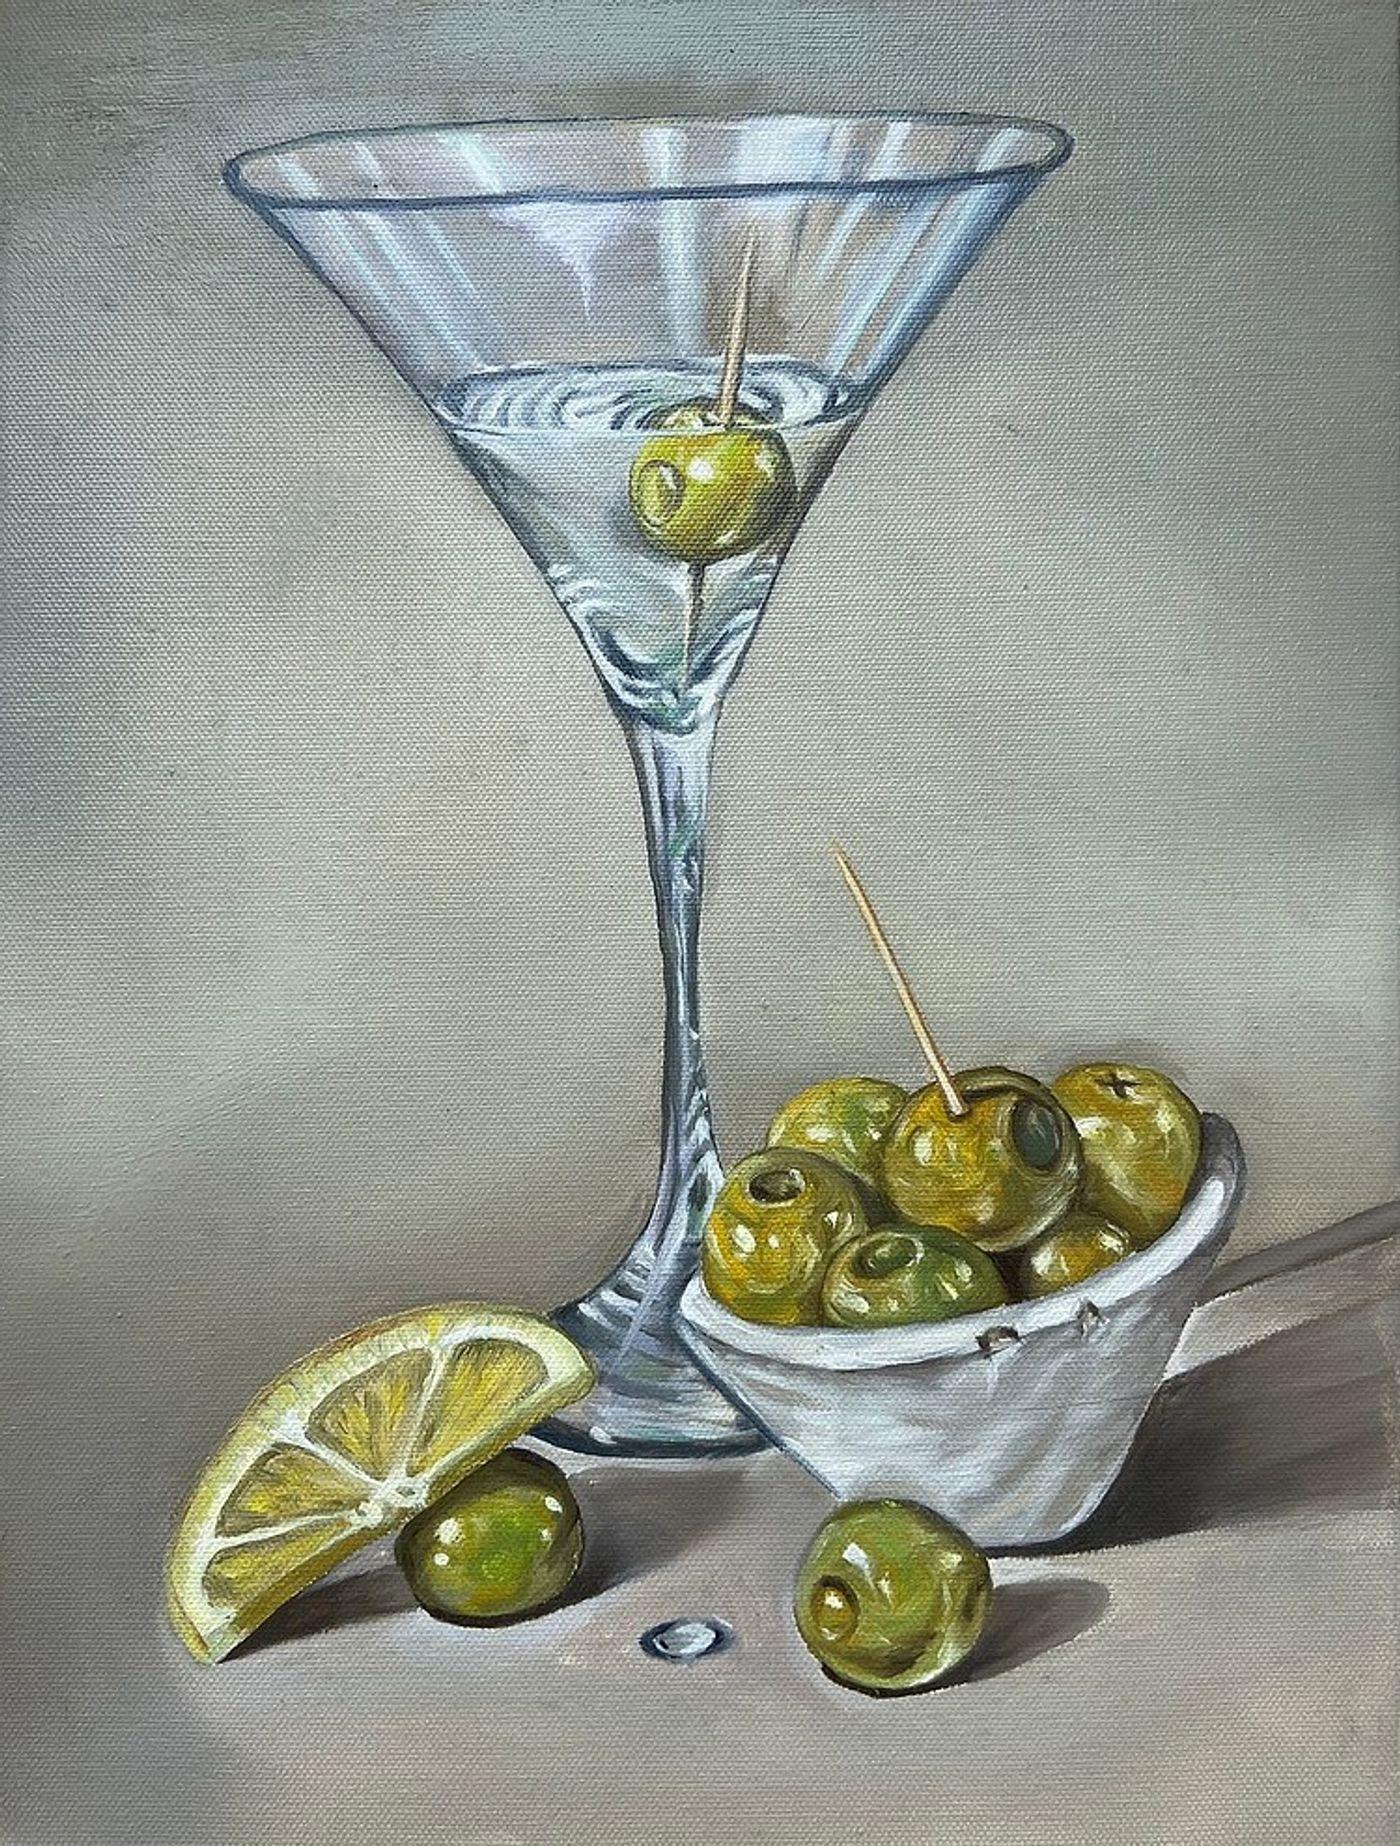 Asya Ulanova, Nurse Painting, 2021. Oil on canvas, 16 x 12 in (40.6 x 30.5 cm).